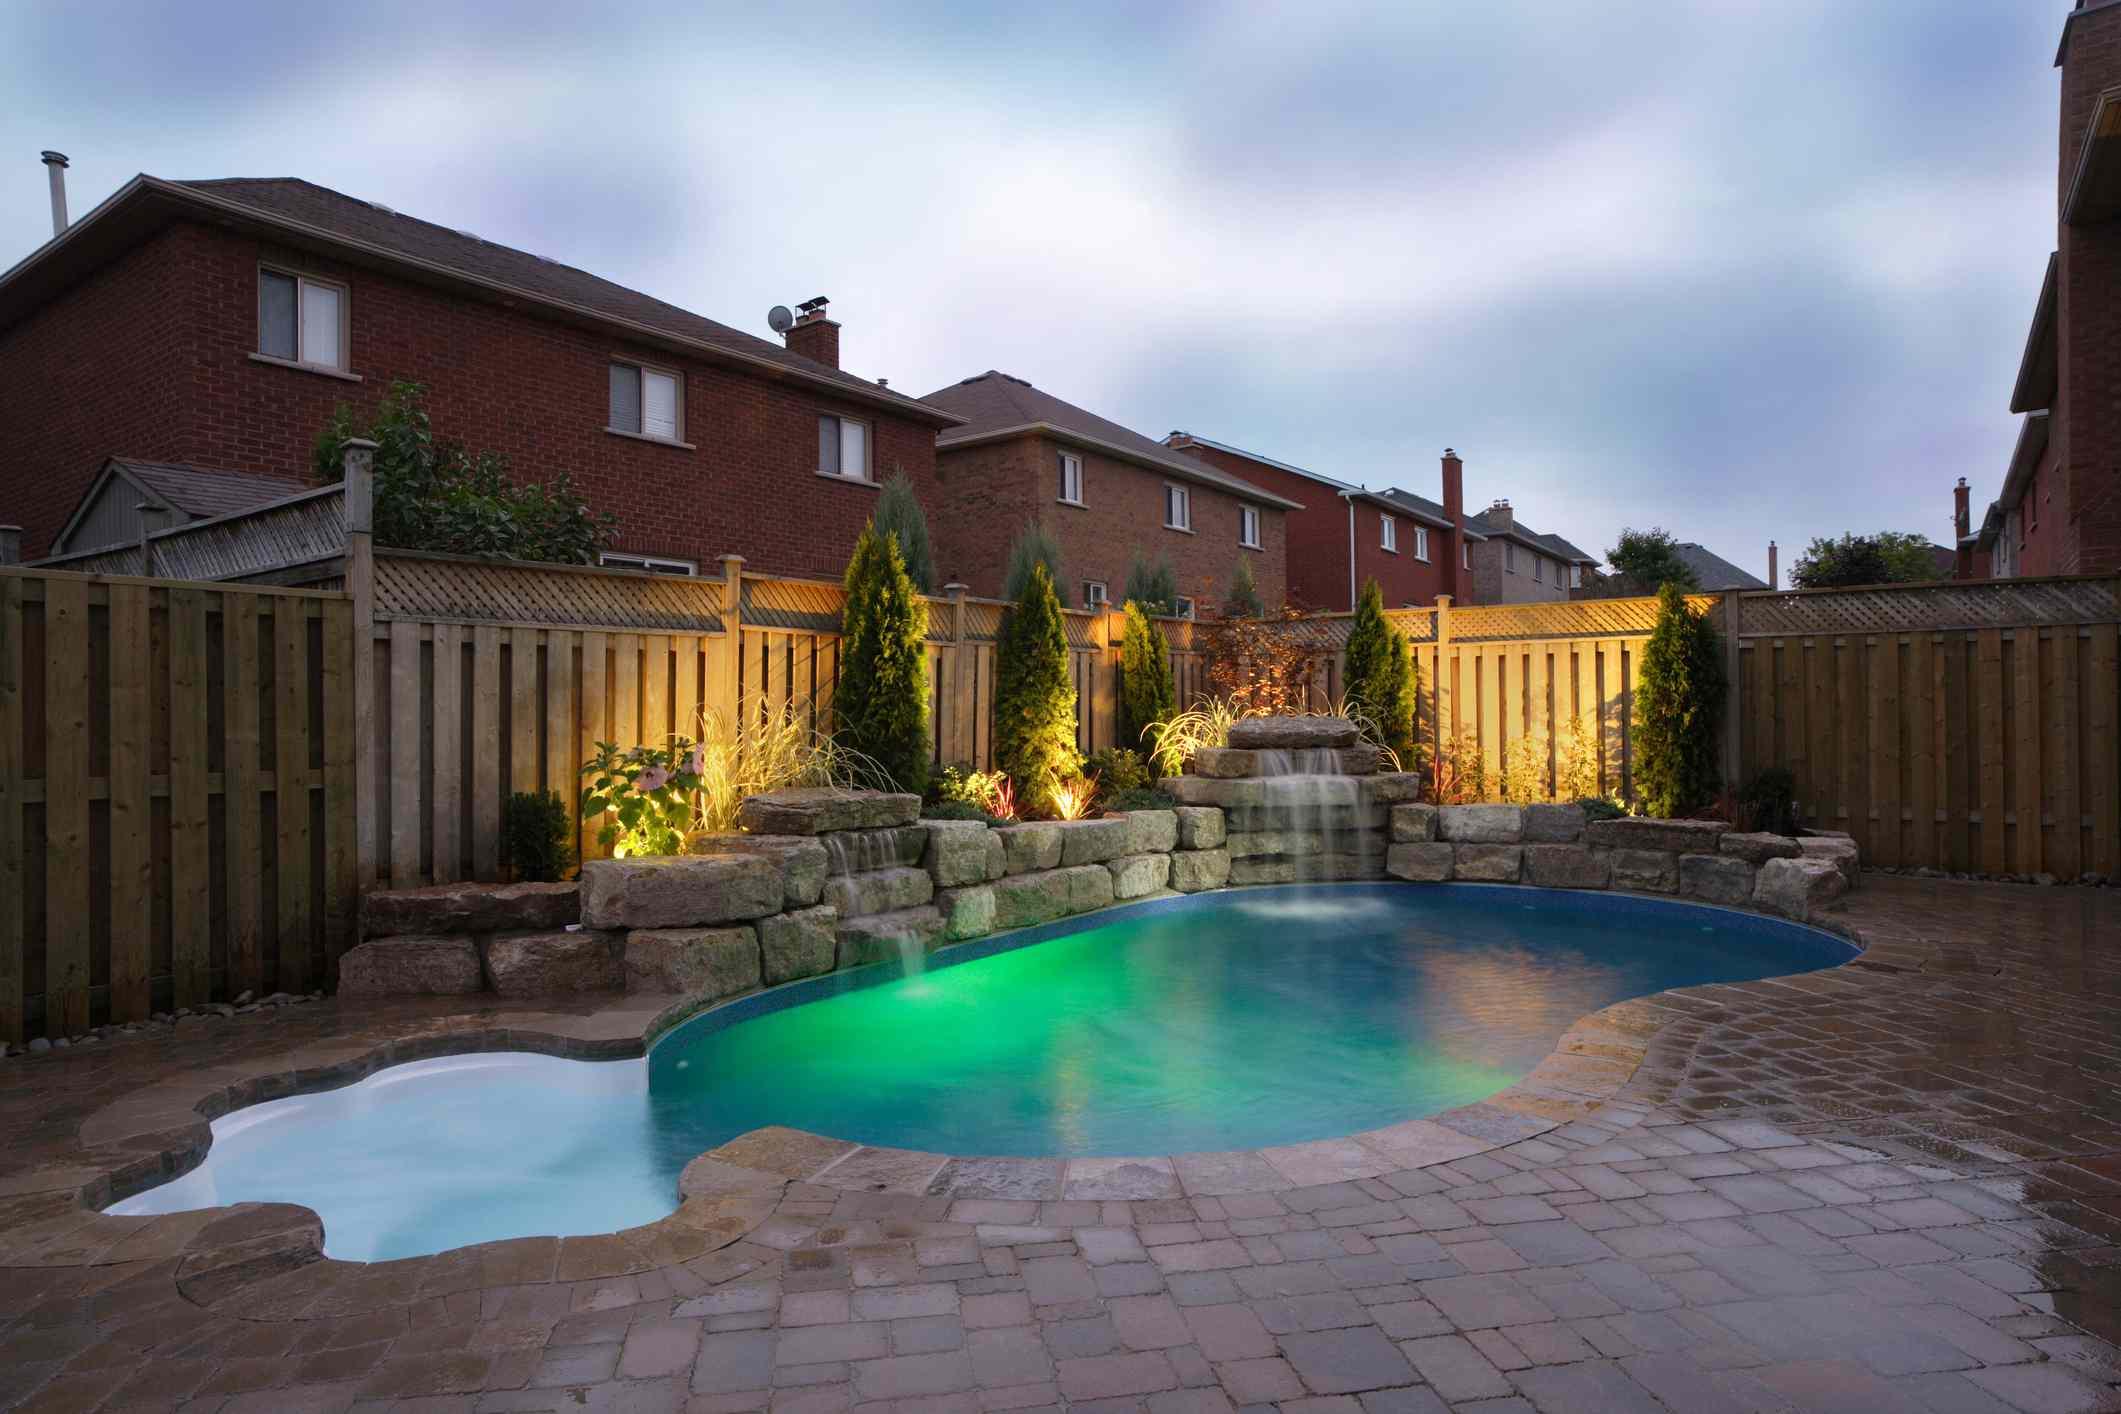 A vinyl swimming pool